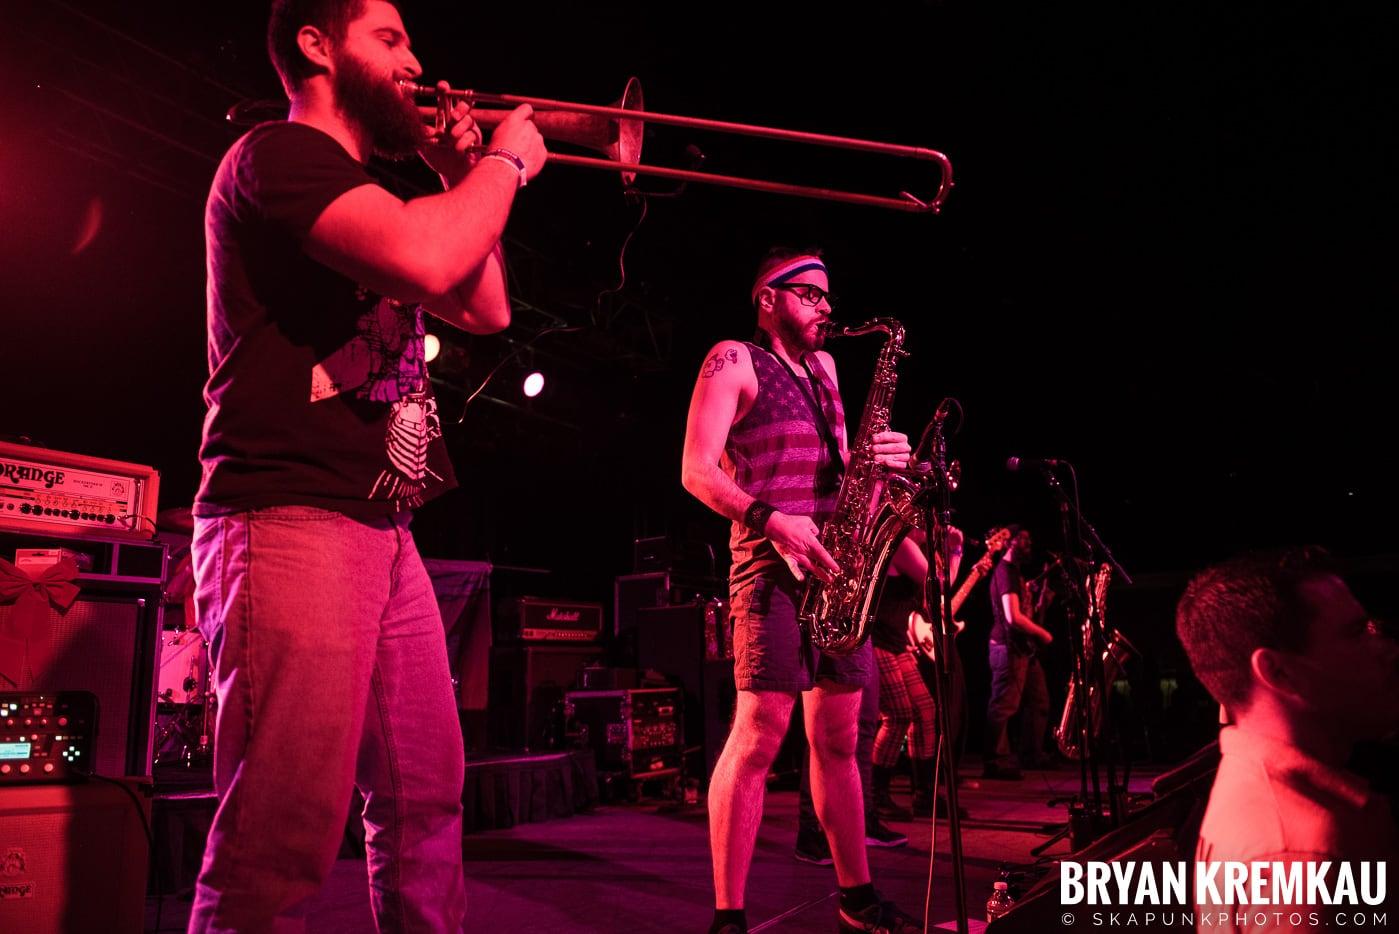 Backyard Superheroes @ Starland Ballroom, Sayreville, NJ - 11.23.18 (24)